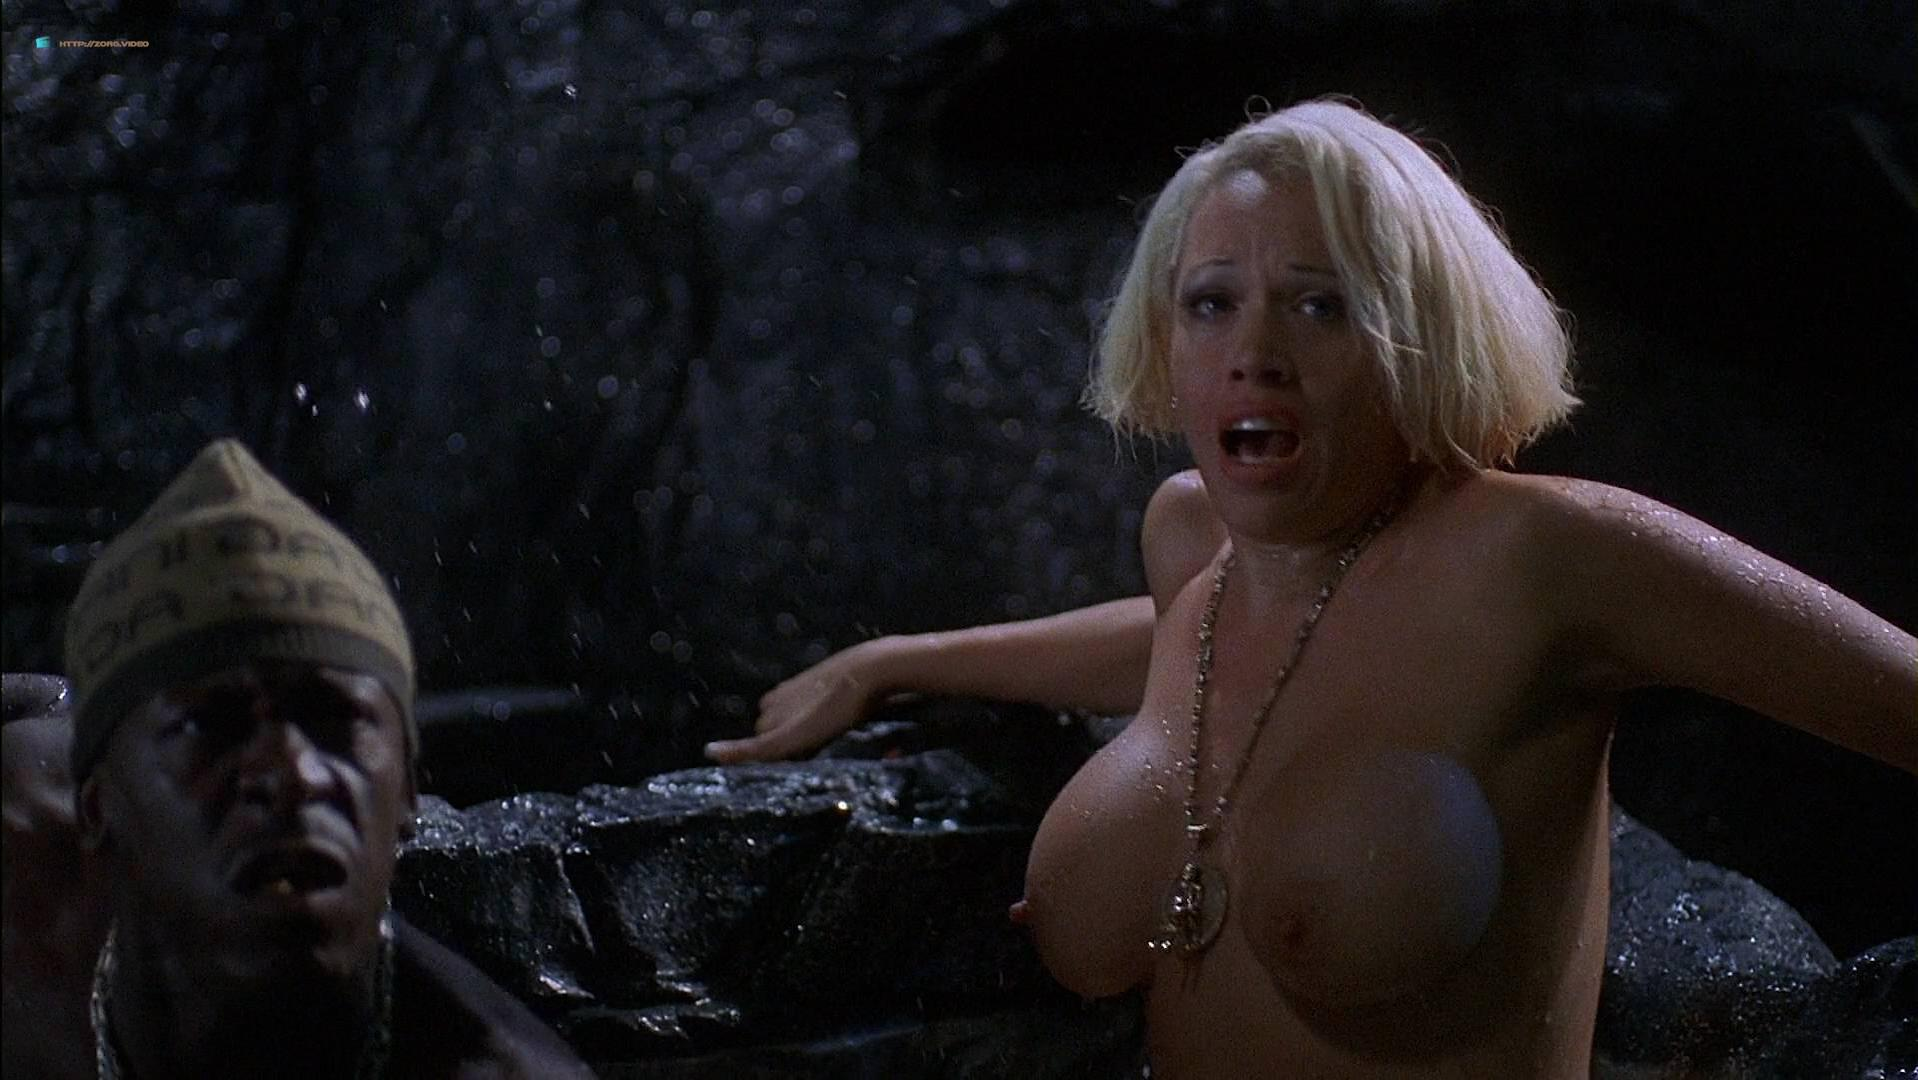 Carla gallo nude boobs in californication scandalplanetcom - 1 part 1